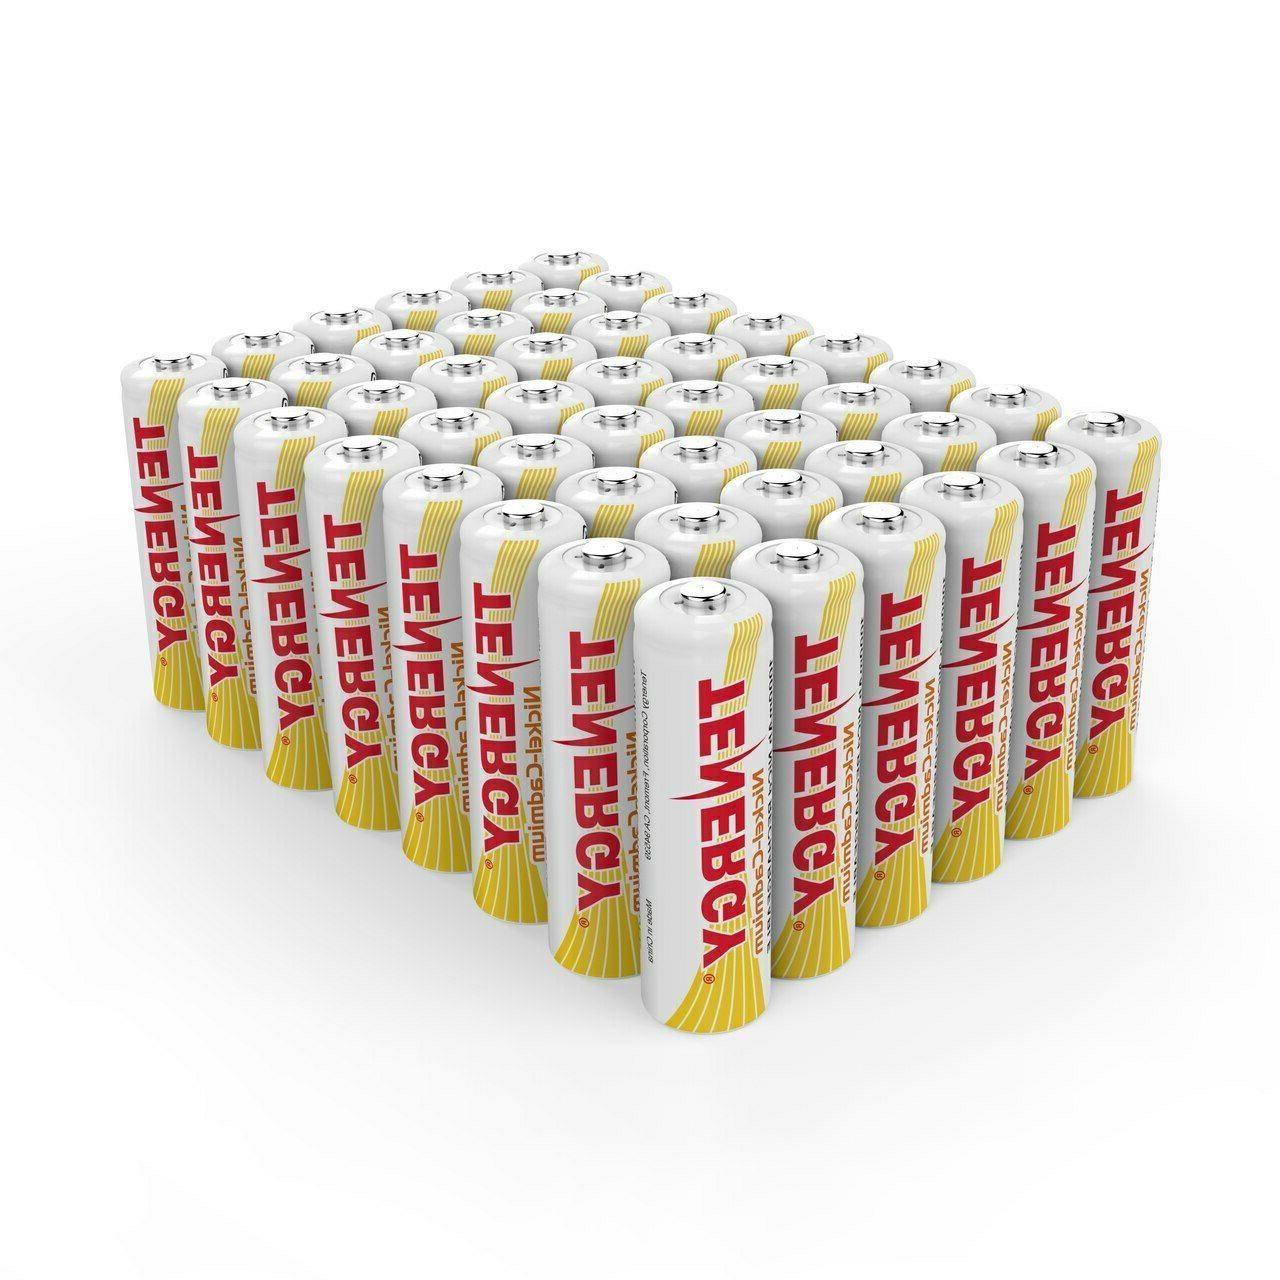 combo aa nicd 1000mah 1 2v rechargeable